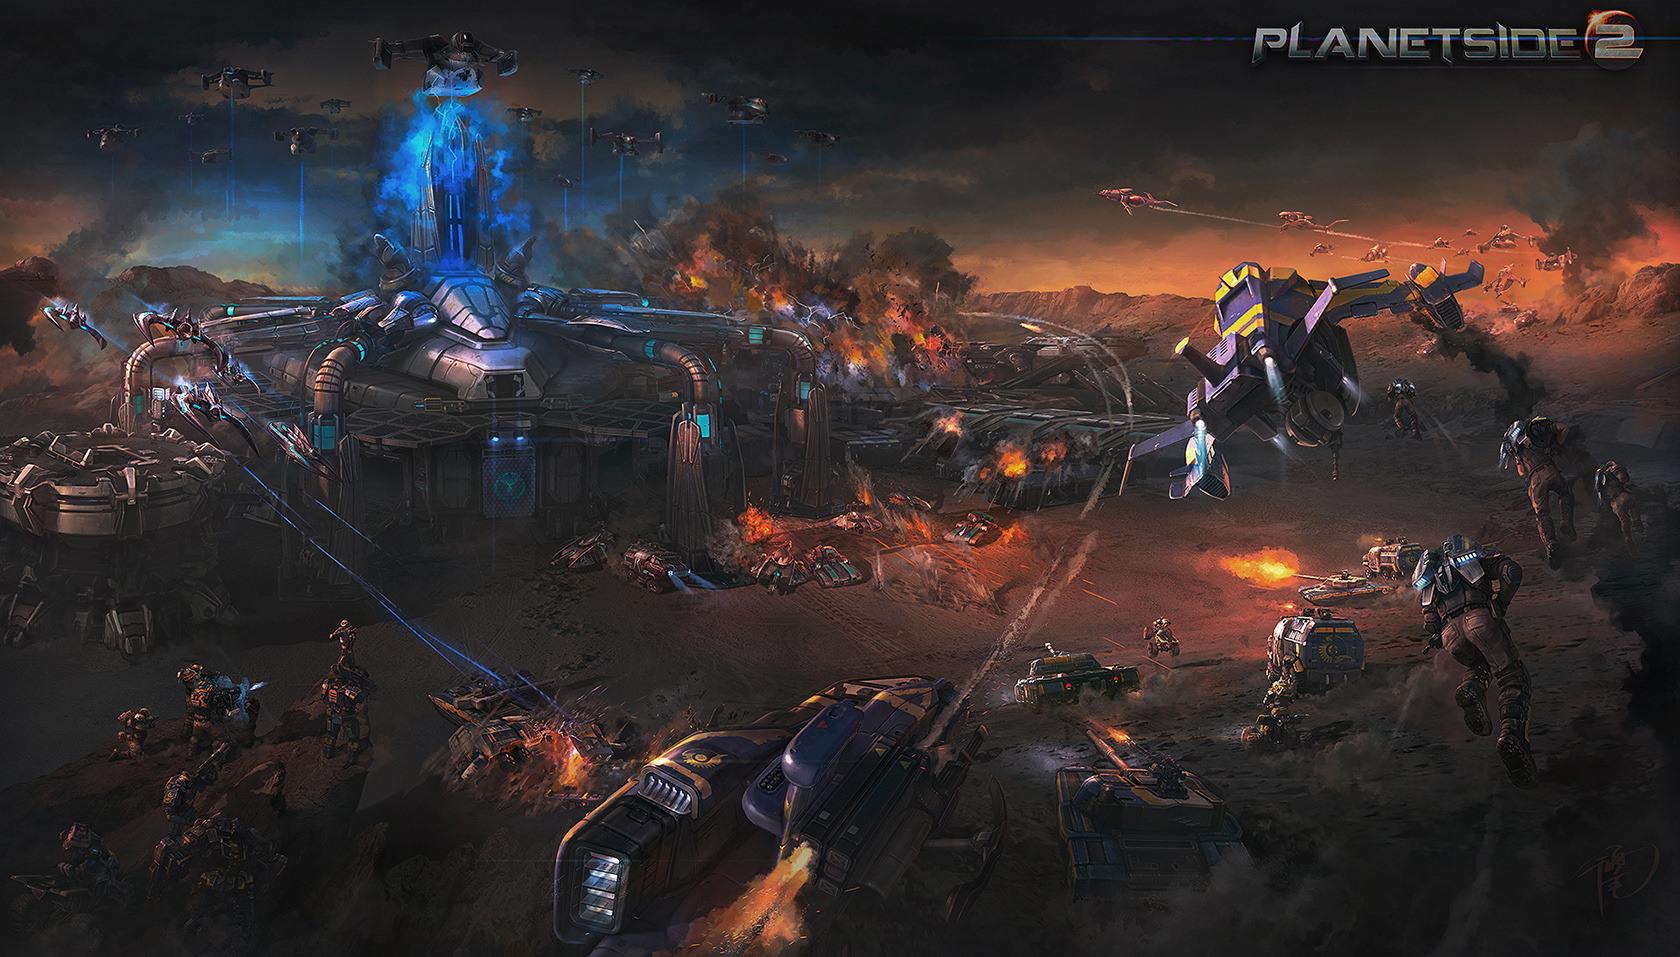 image planetside2 epic war by mourad jpg planetside 2 wiki